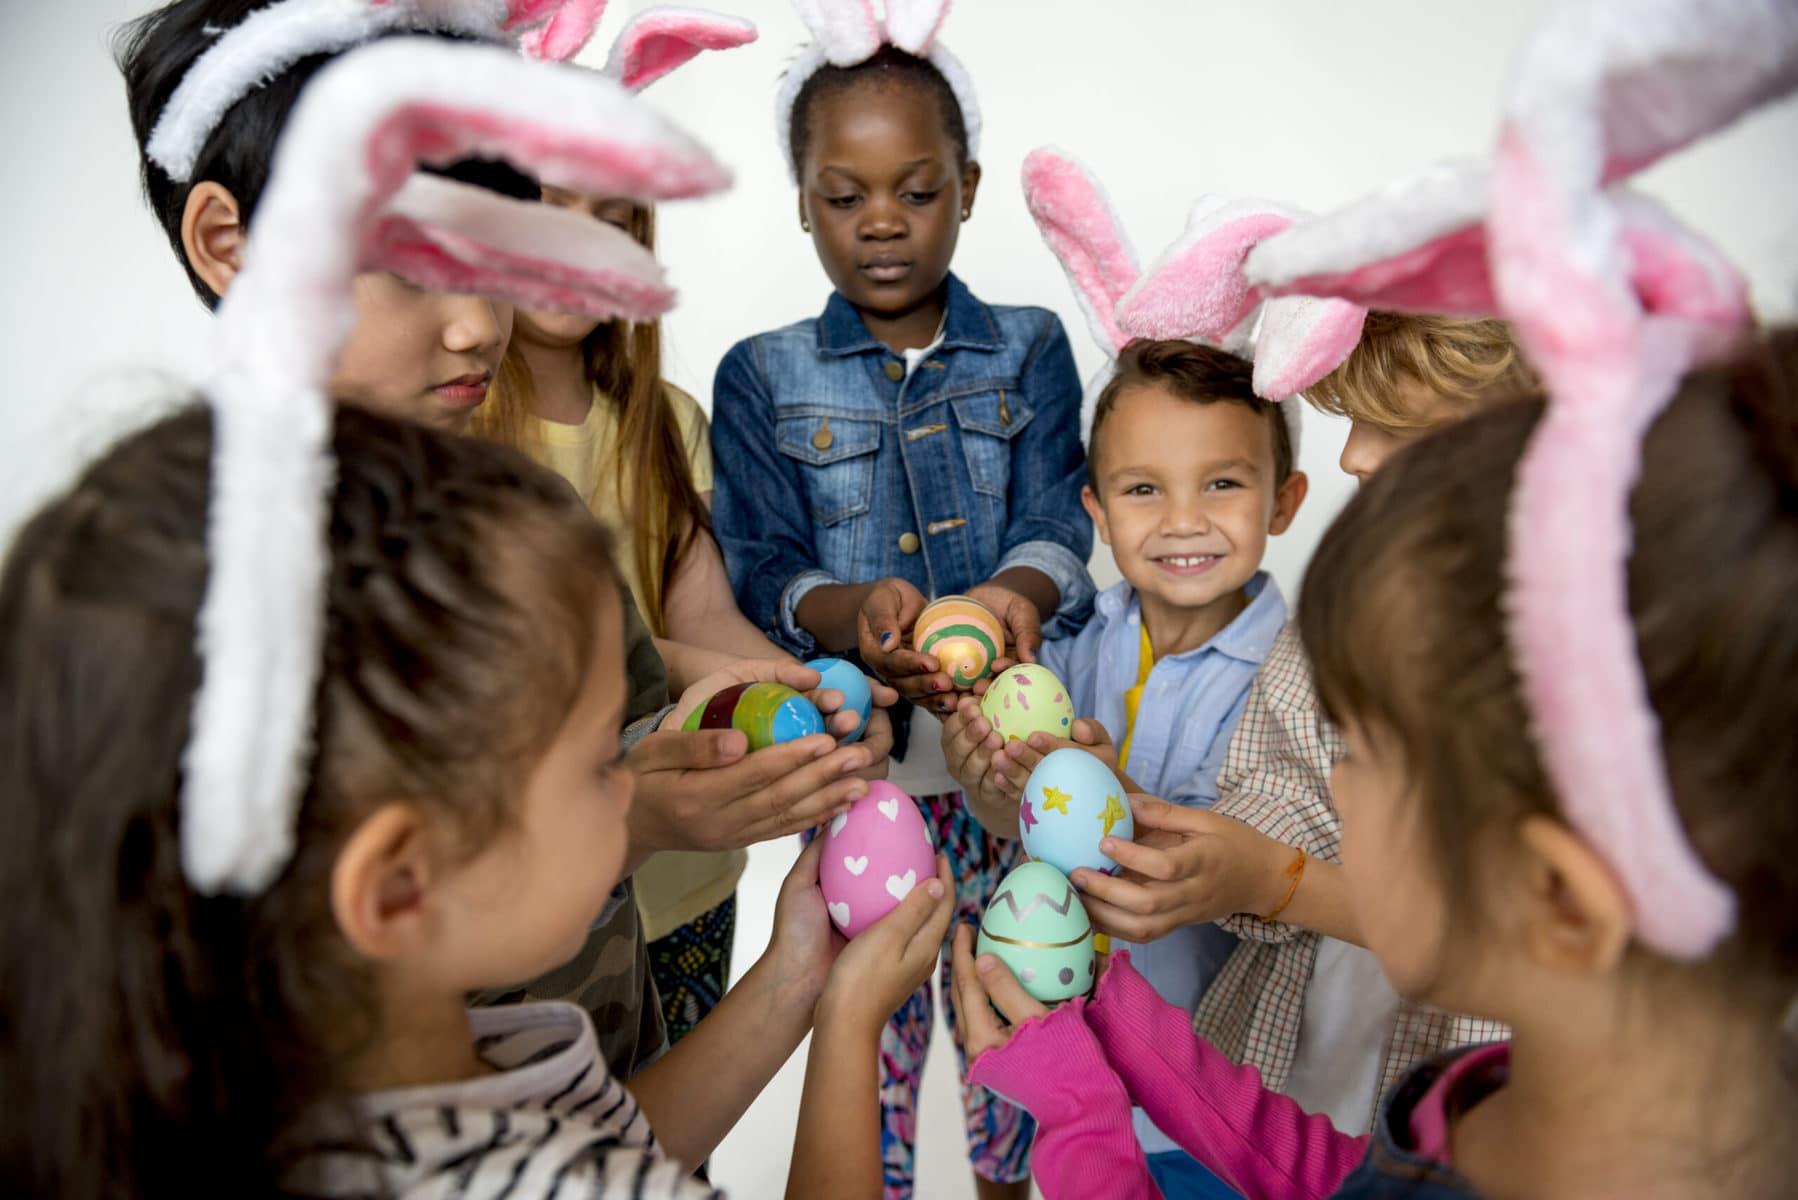 Group of kids on Easter holding Easter eggs.